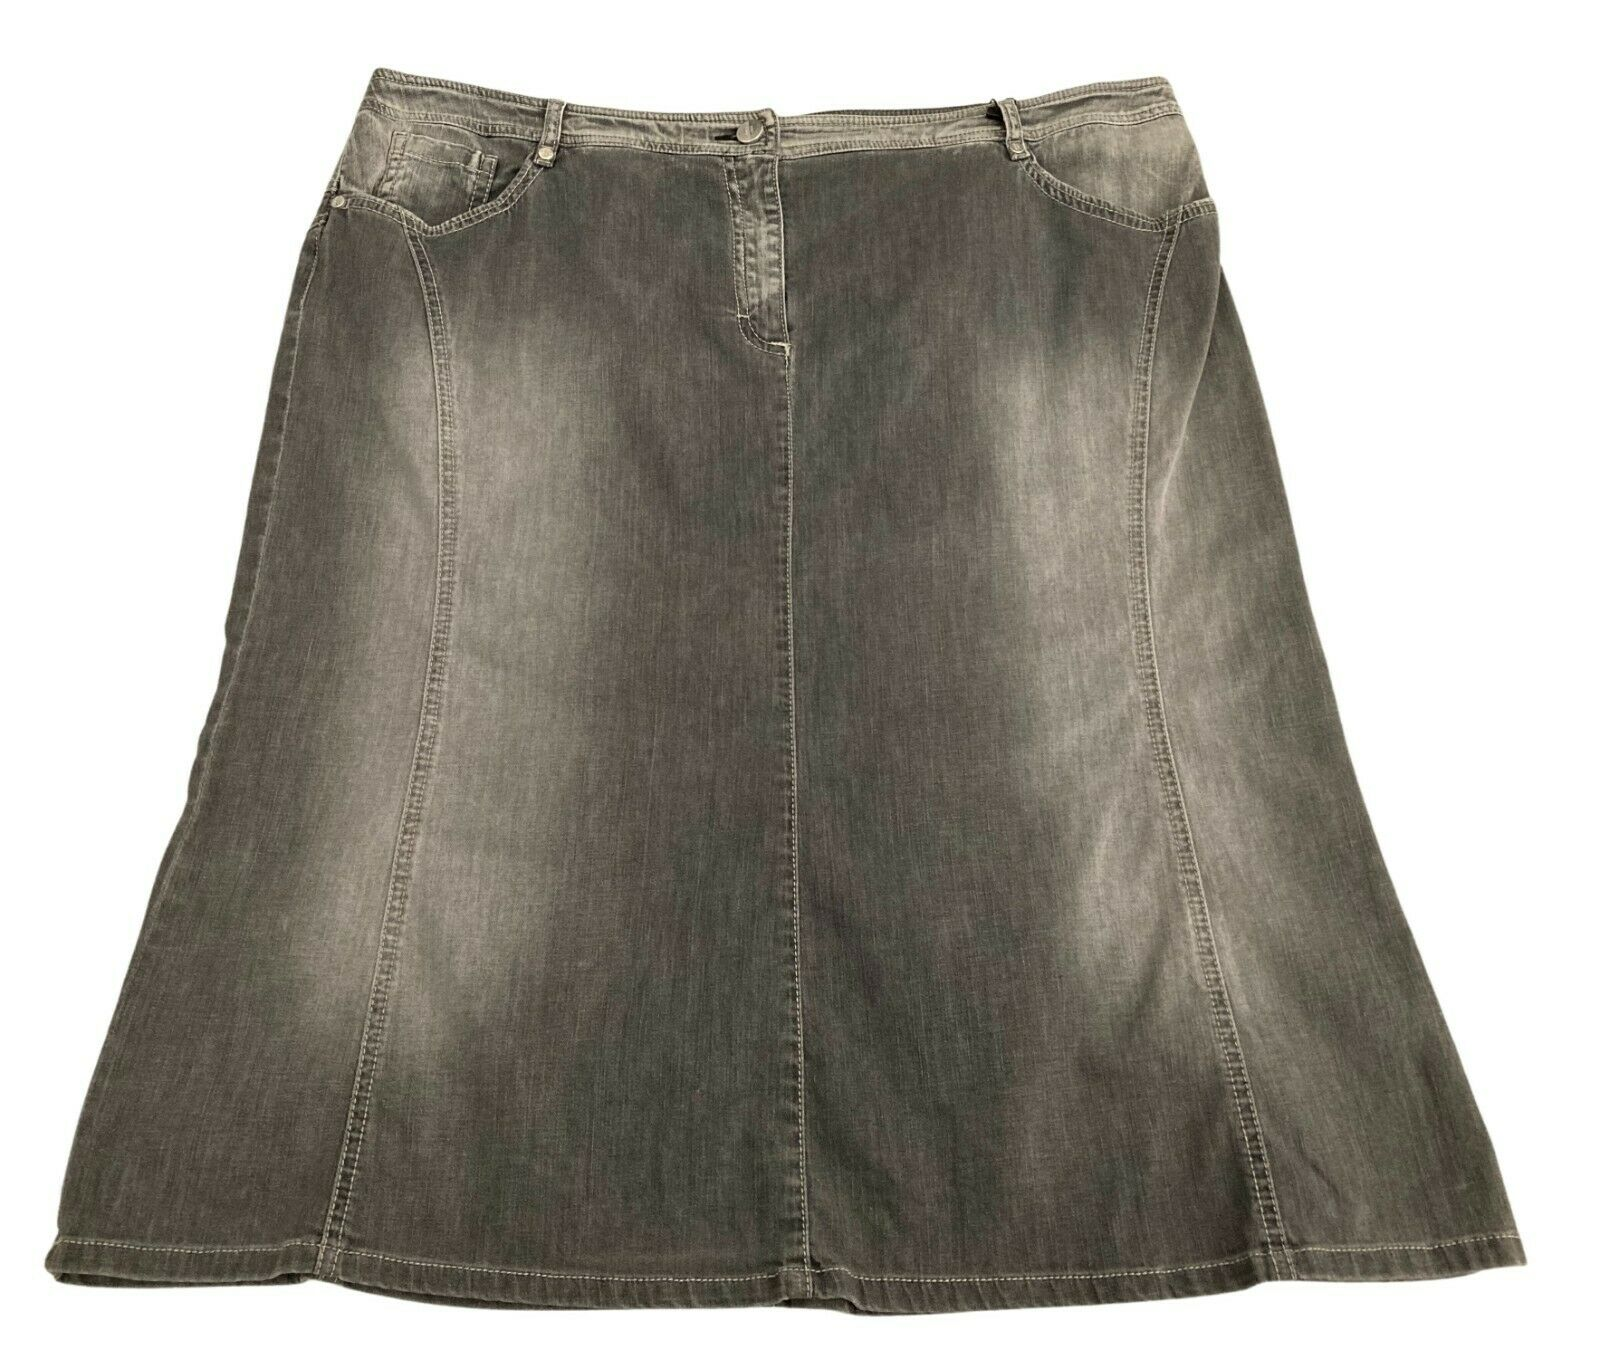 ELENA MIRò Rock Frau Jeans Grau Vintage Art. 1168F 1544J